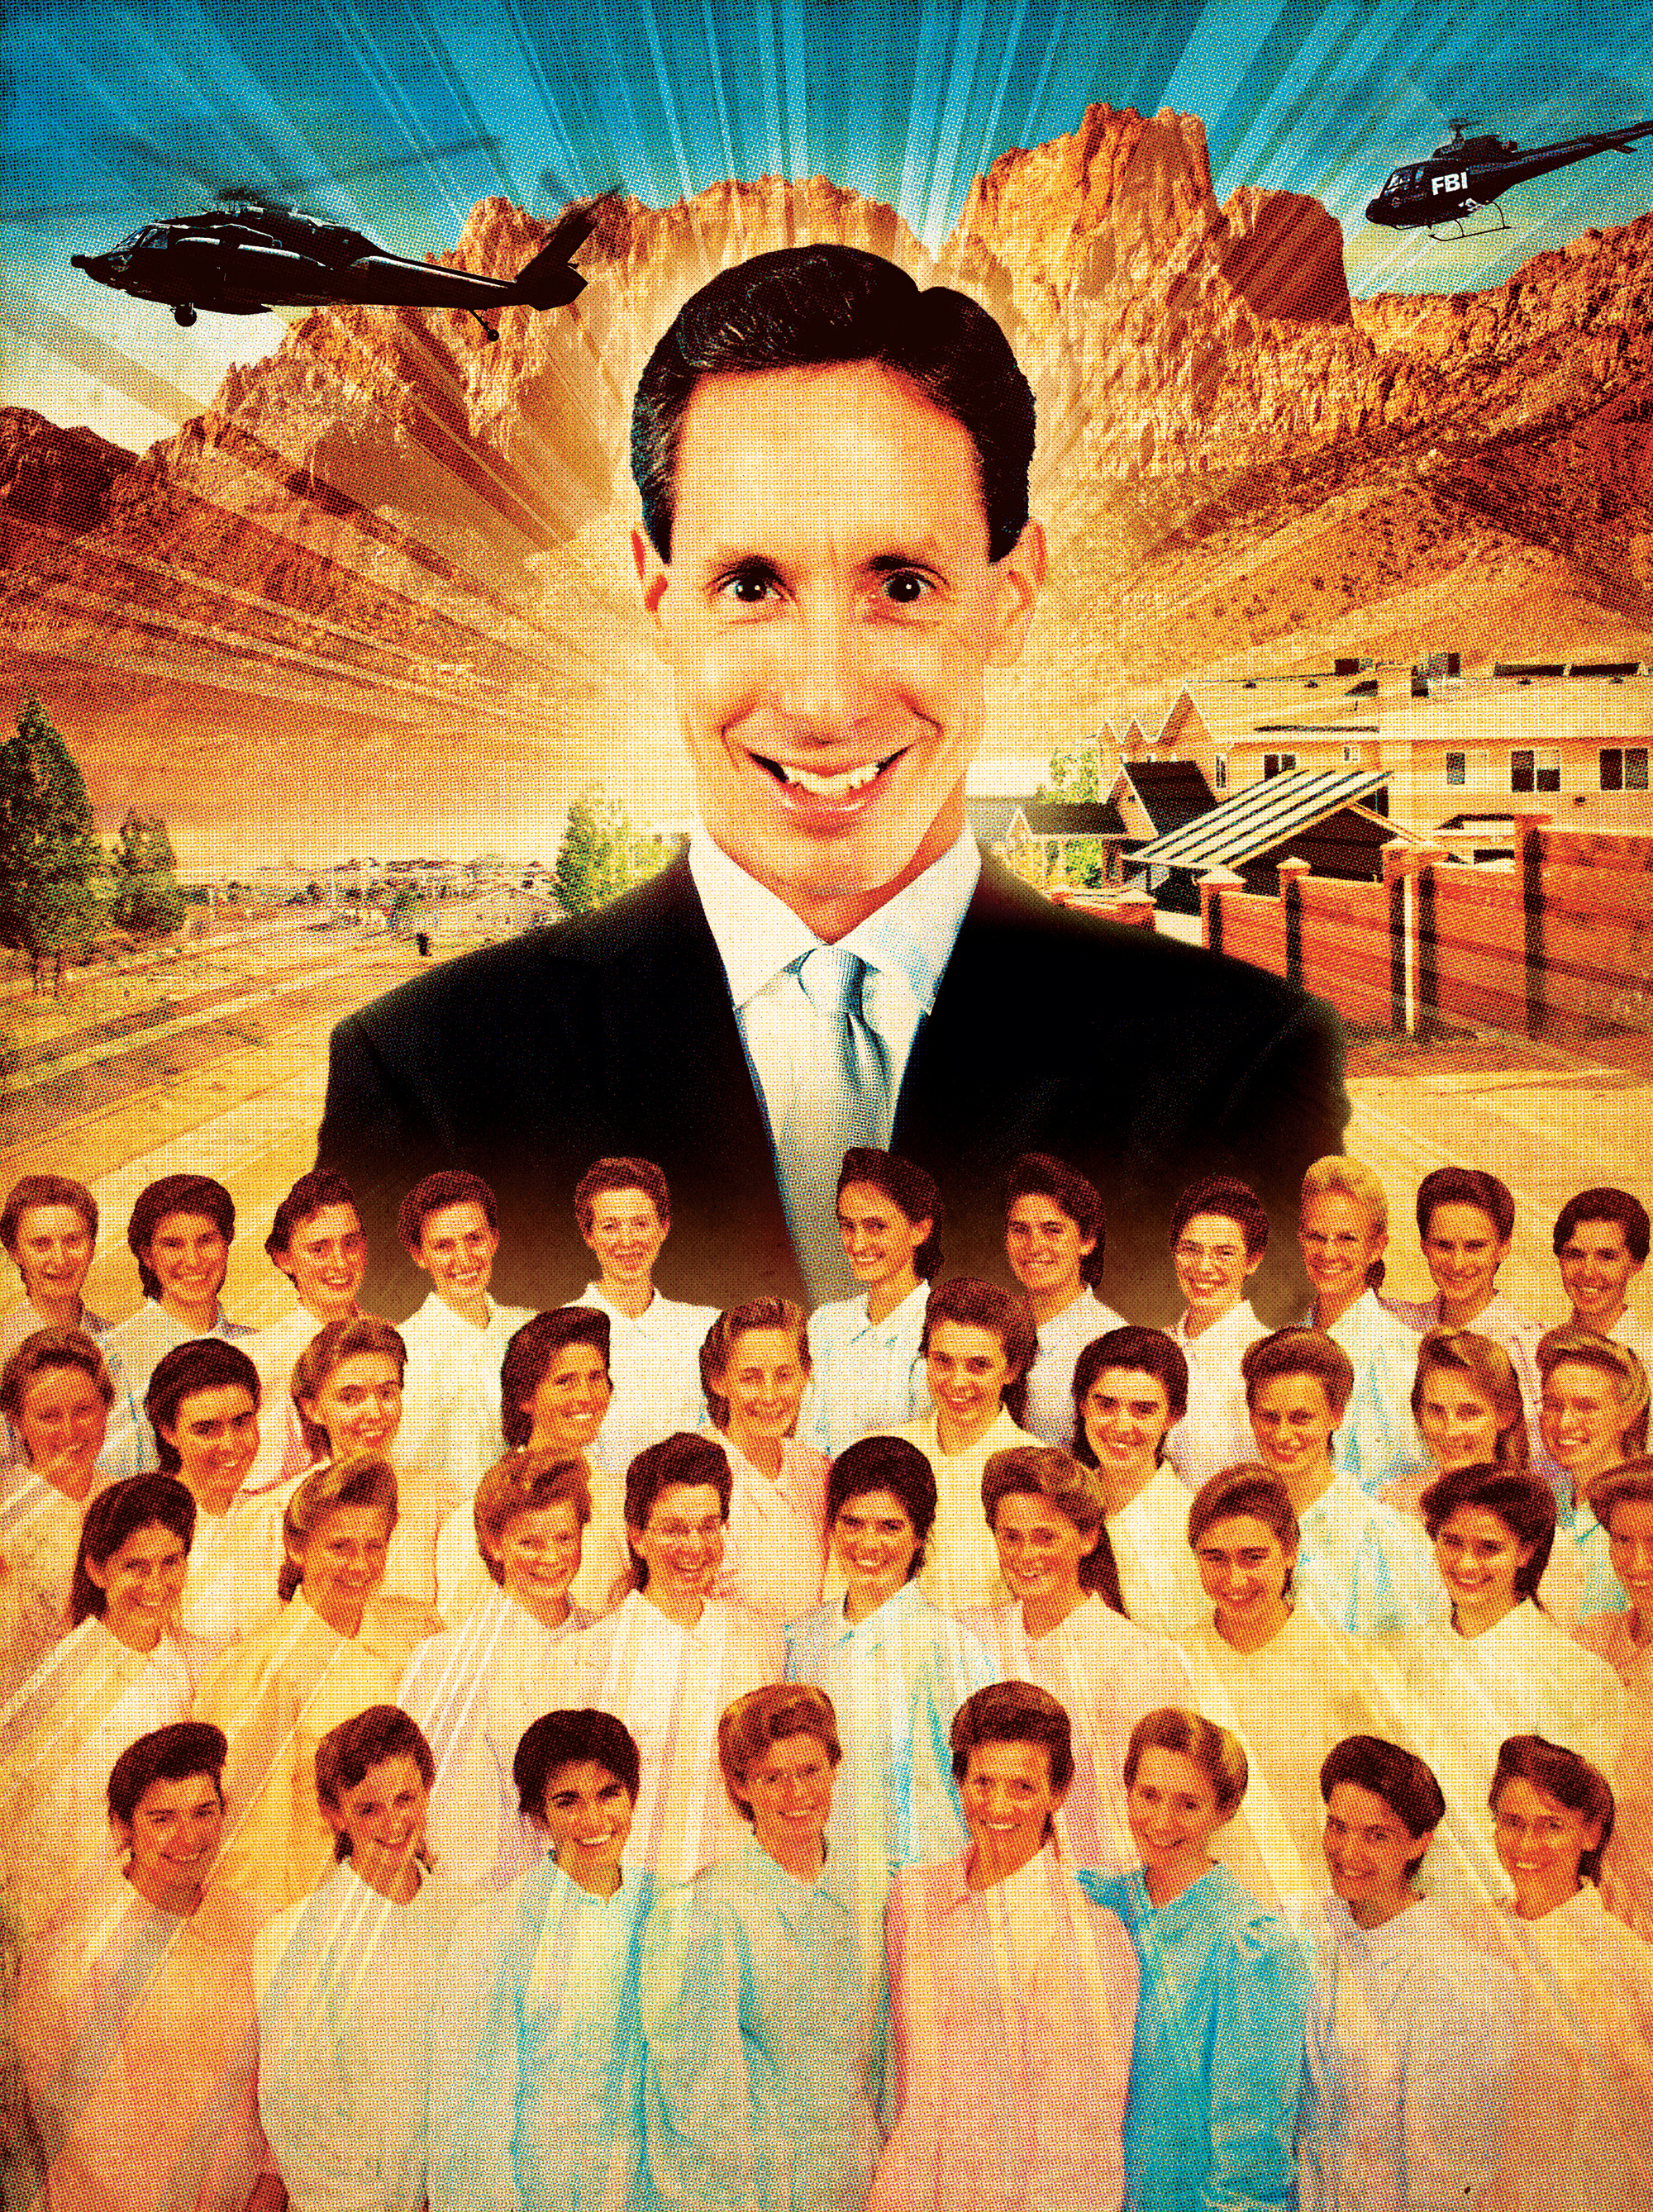 Mormon polygamy dating site